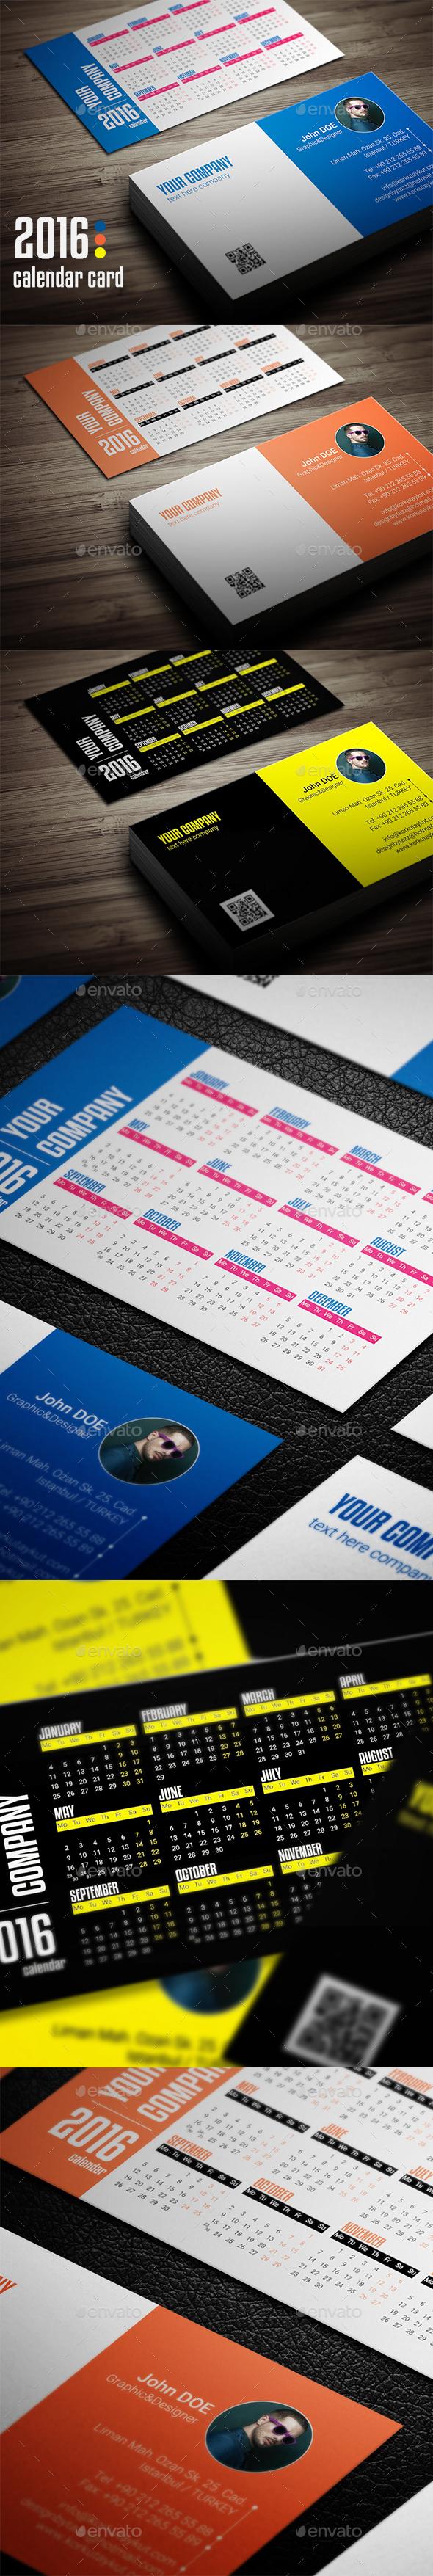 Calendar 2016 Business Card - Business Cards Print Templates